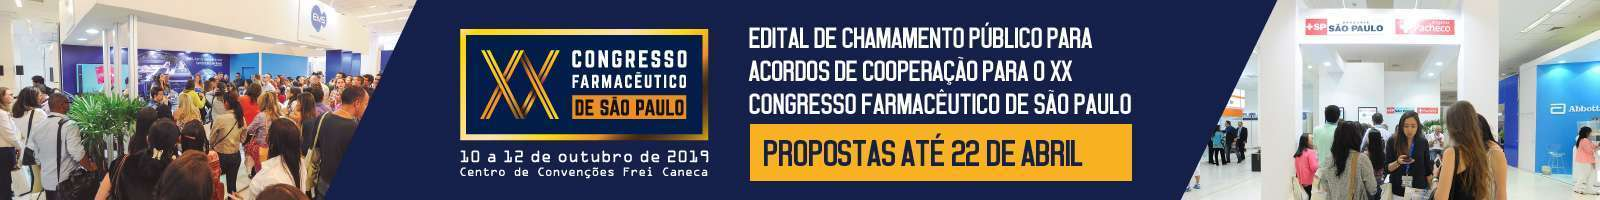 XX Congresso: Chamamento Público